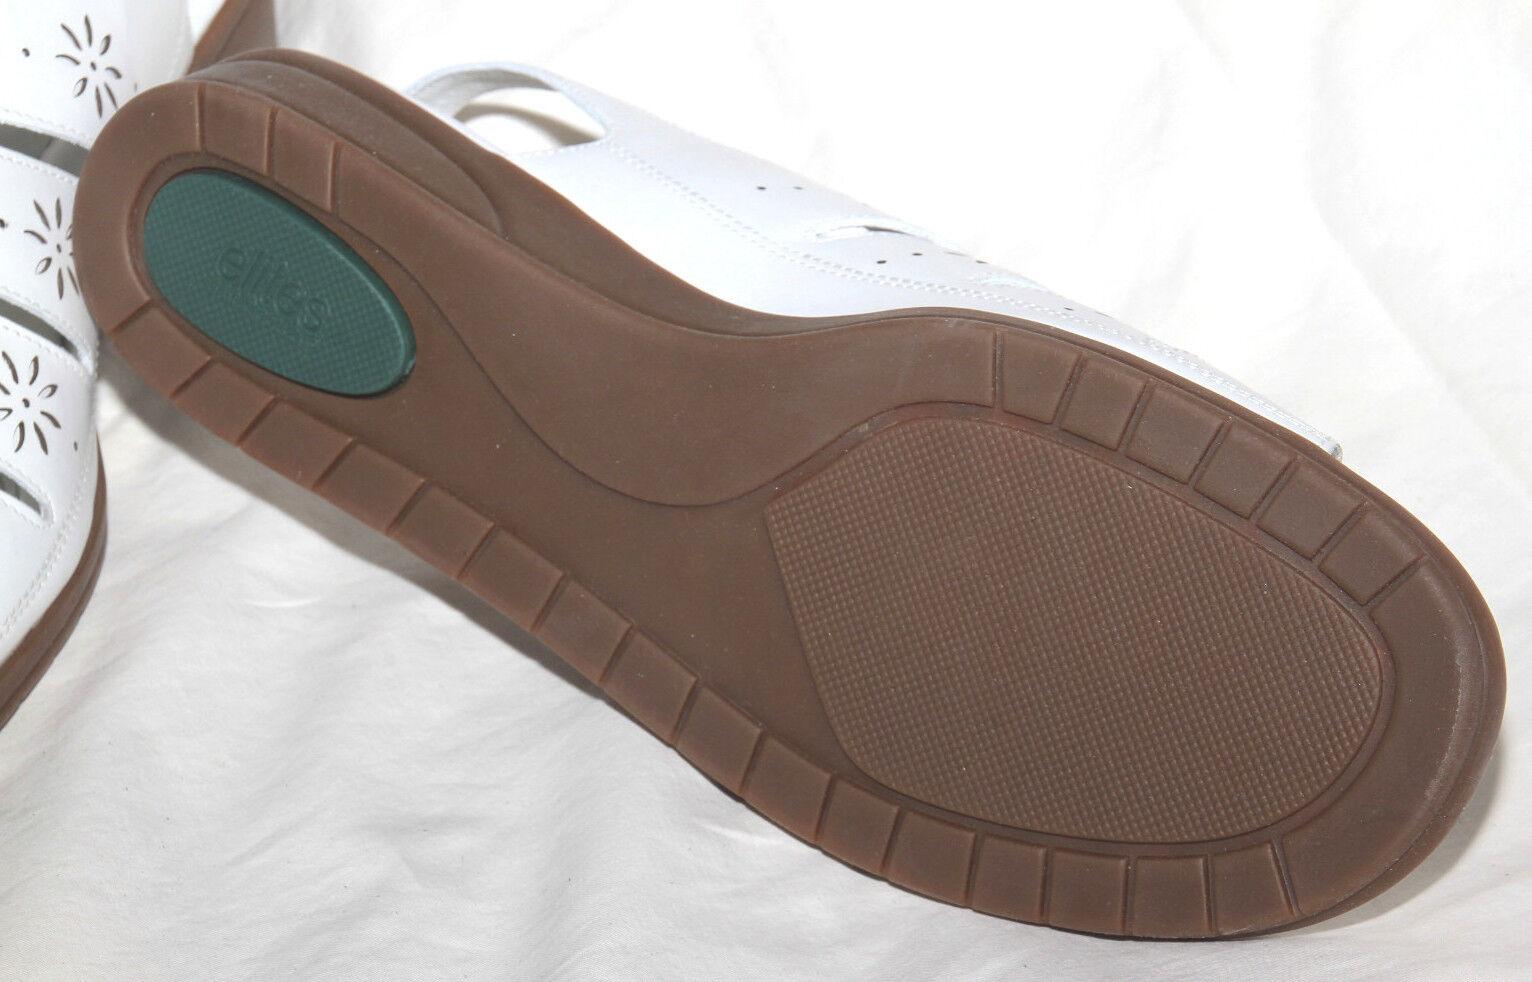 Damenschuhe CRADLES Schuhes Elites by WALKING CRADLES Damenschuhe 'Vase' Weiß Leder Sandales Größe 11 140 d09cf5